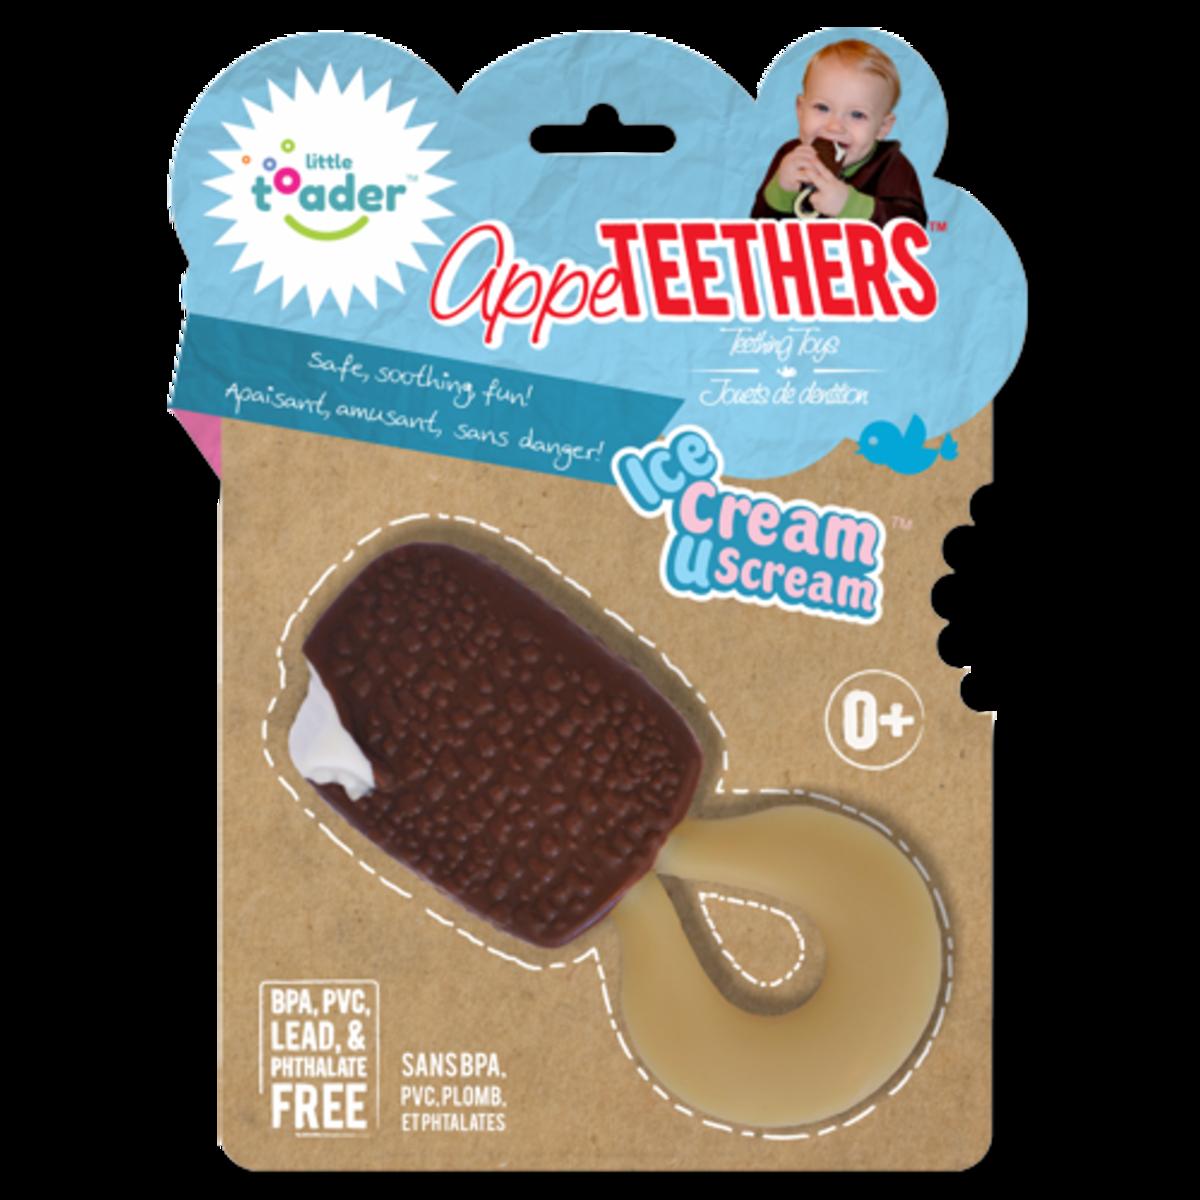 Ice-Cream-U-Scream-Packaging-v2-square-500x500